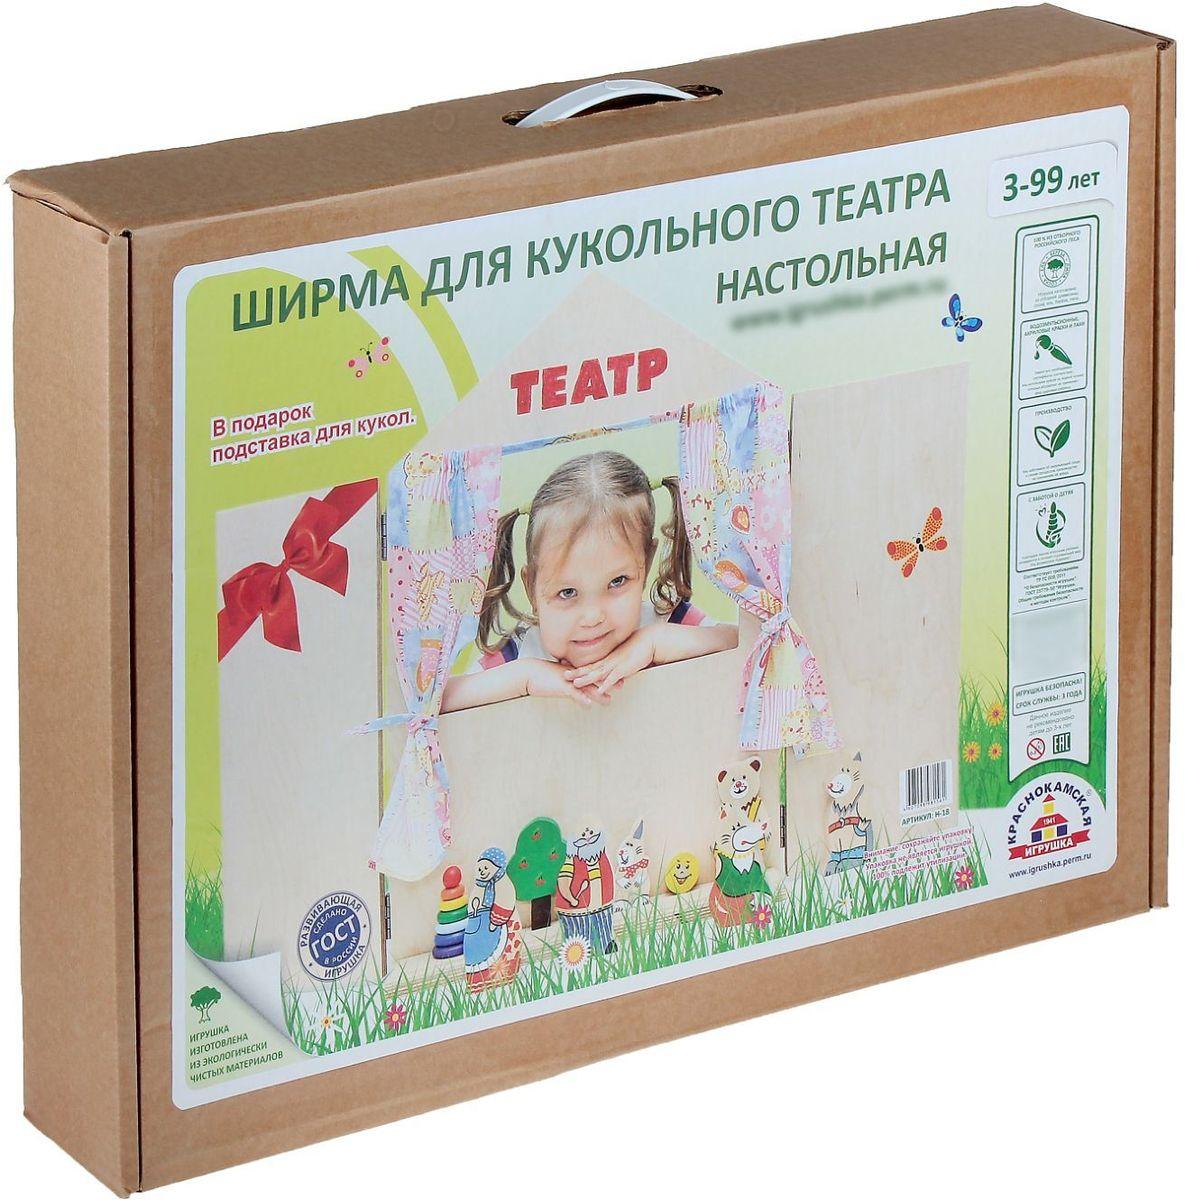 цена на Sima-land Ширма для кукольного театра